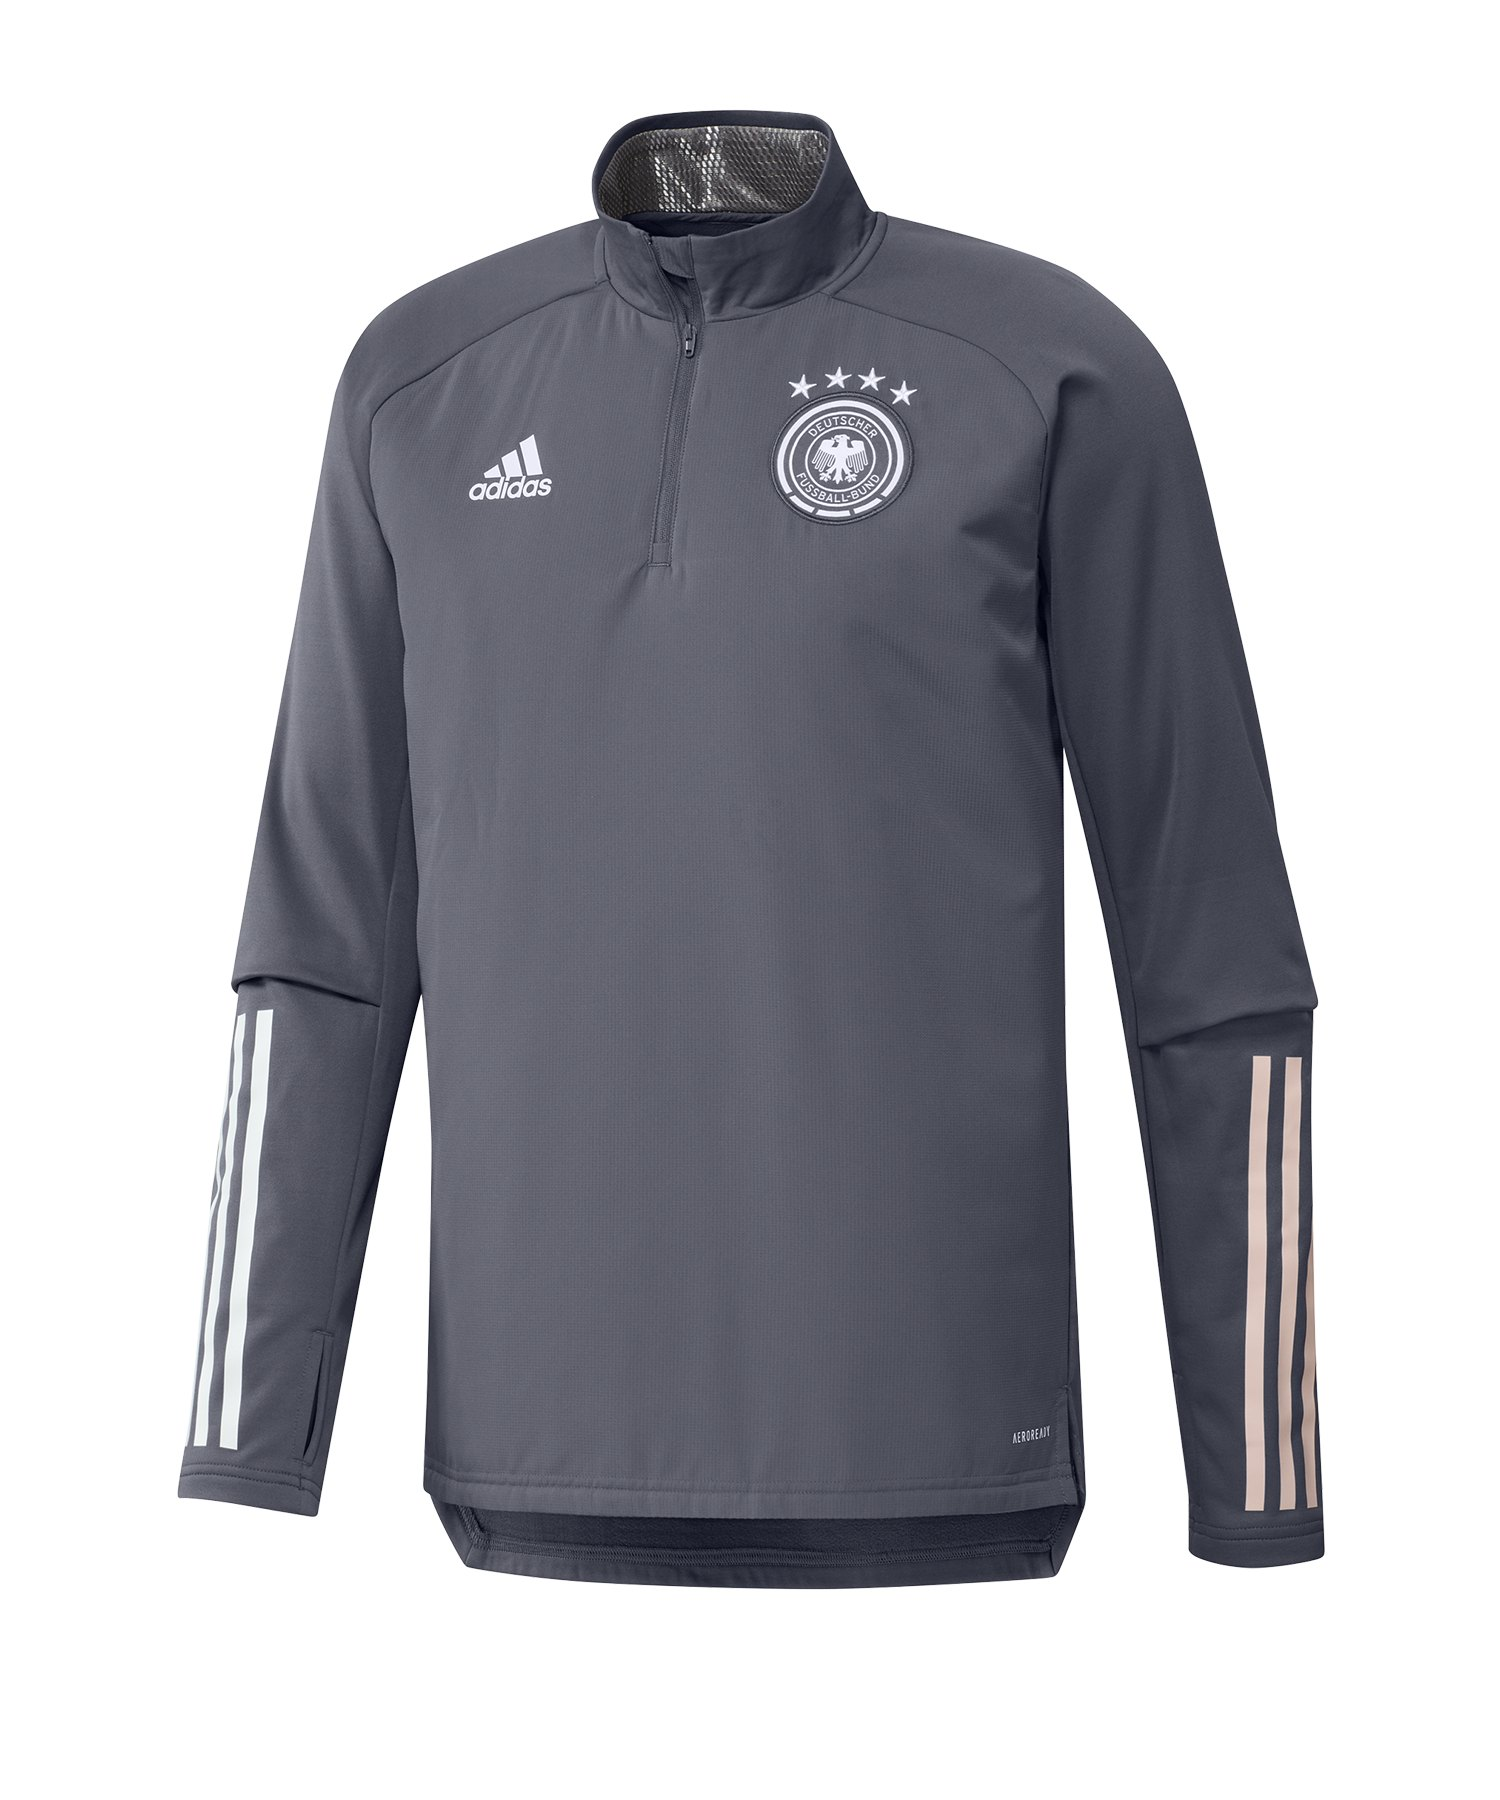 adidas DFB Deutschland 1/2 Zip Top LS Grau - grau